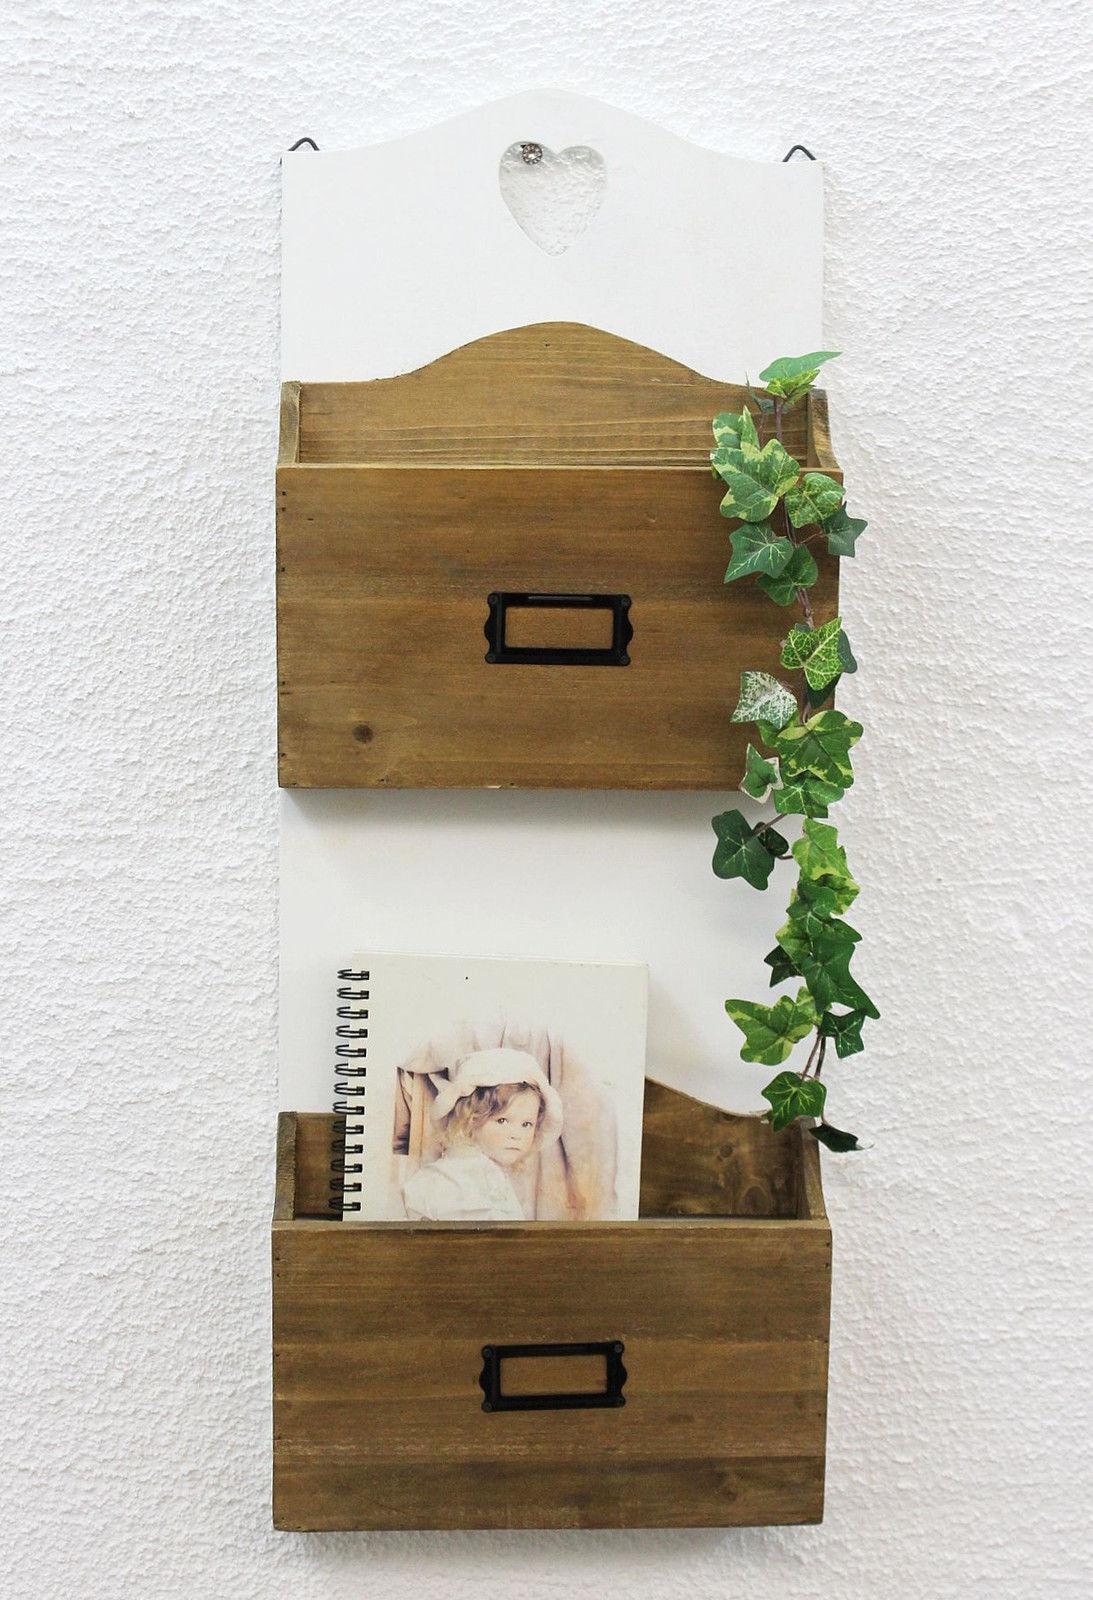 wandregal mit herz 12028 regal 60cm vintage shabby landhaus k chenregal wei ebay. Black Bedroom Furniture Sets. Home Design Ideas